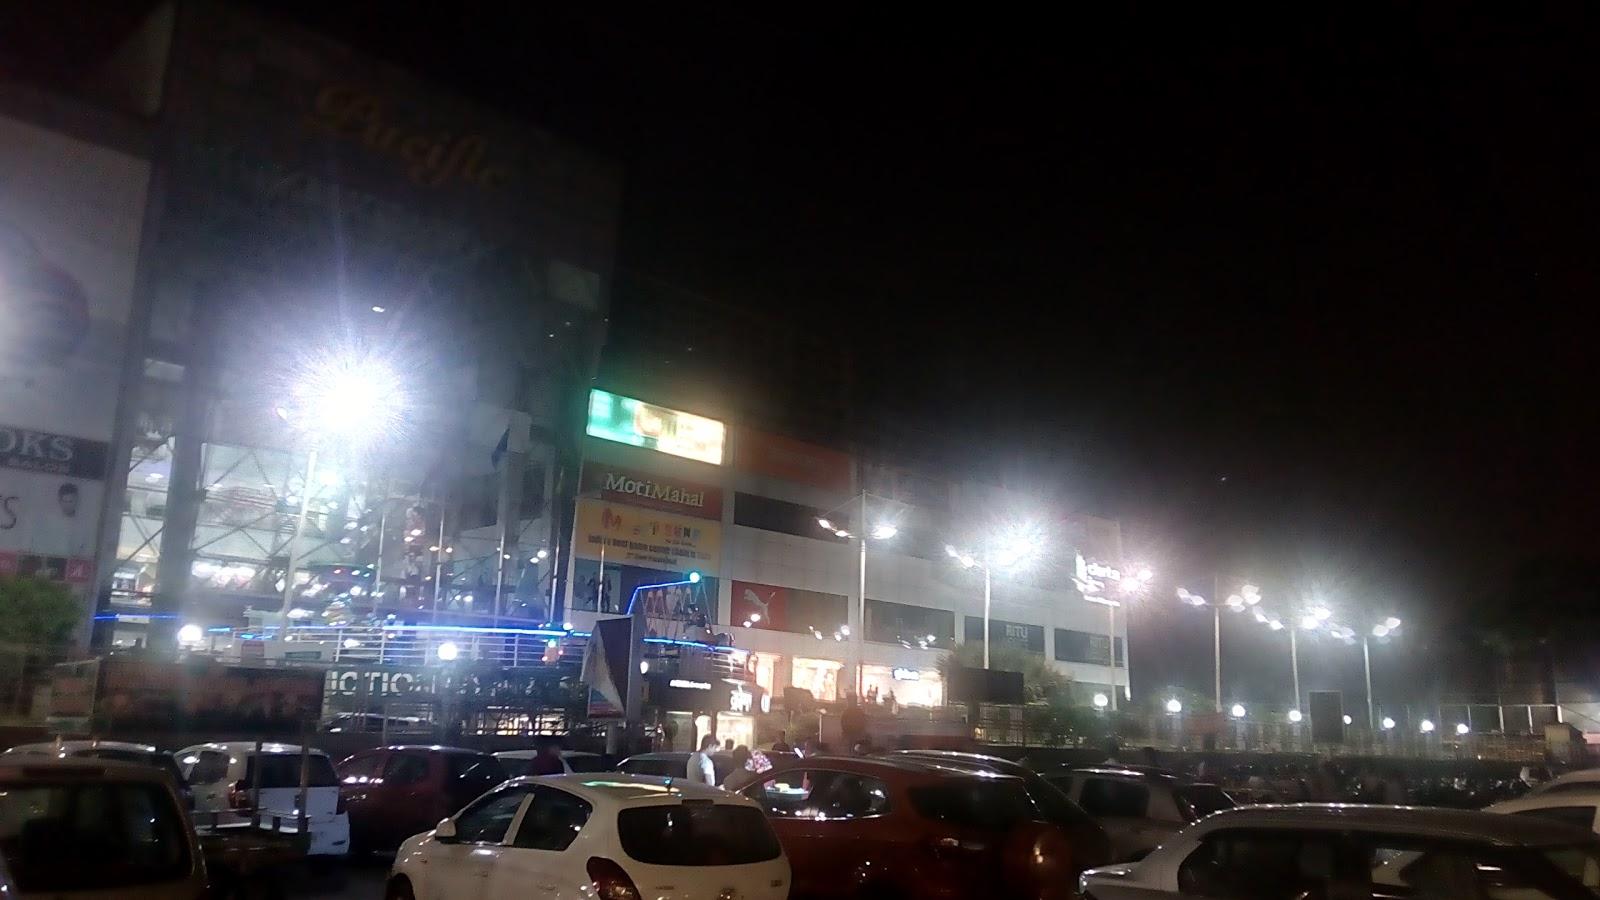 BIG Cinemas (Pacific Mall)